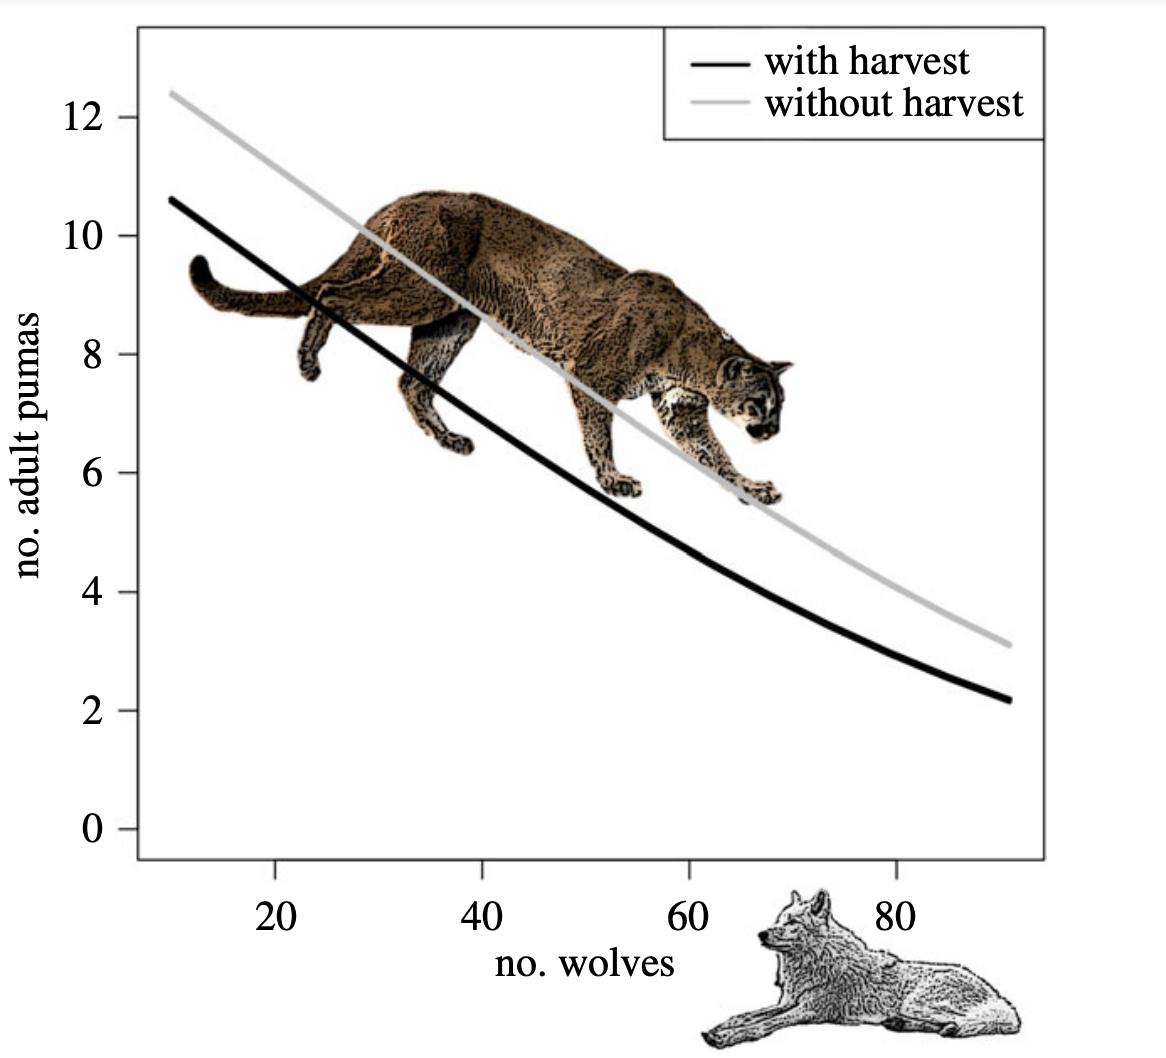 Wolf population effects